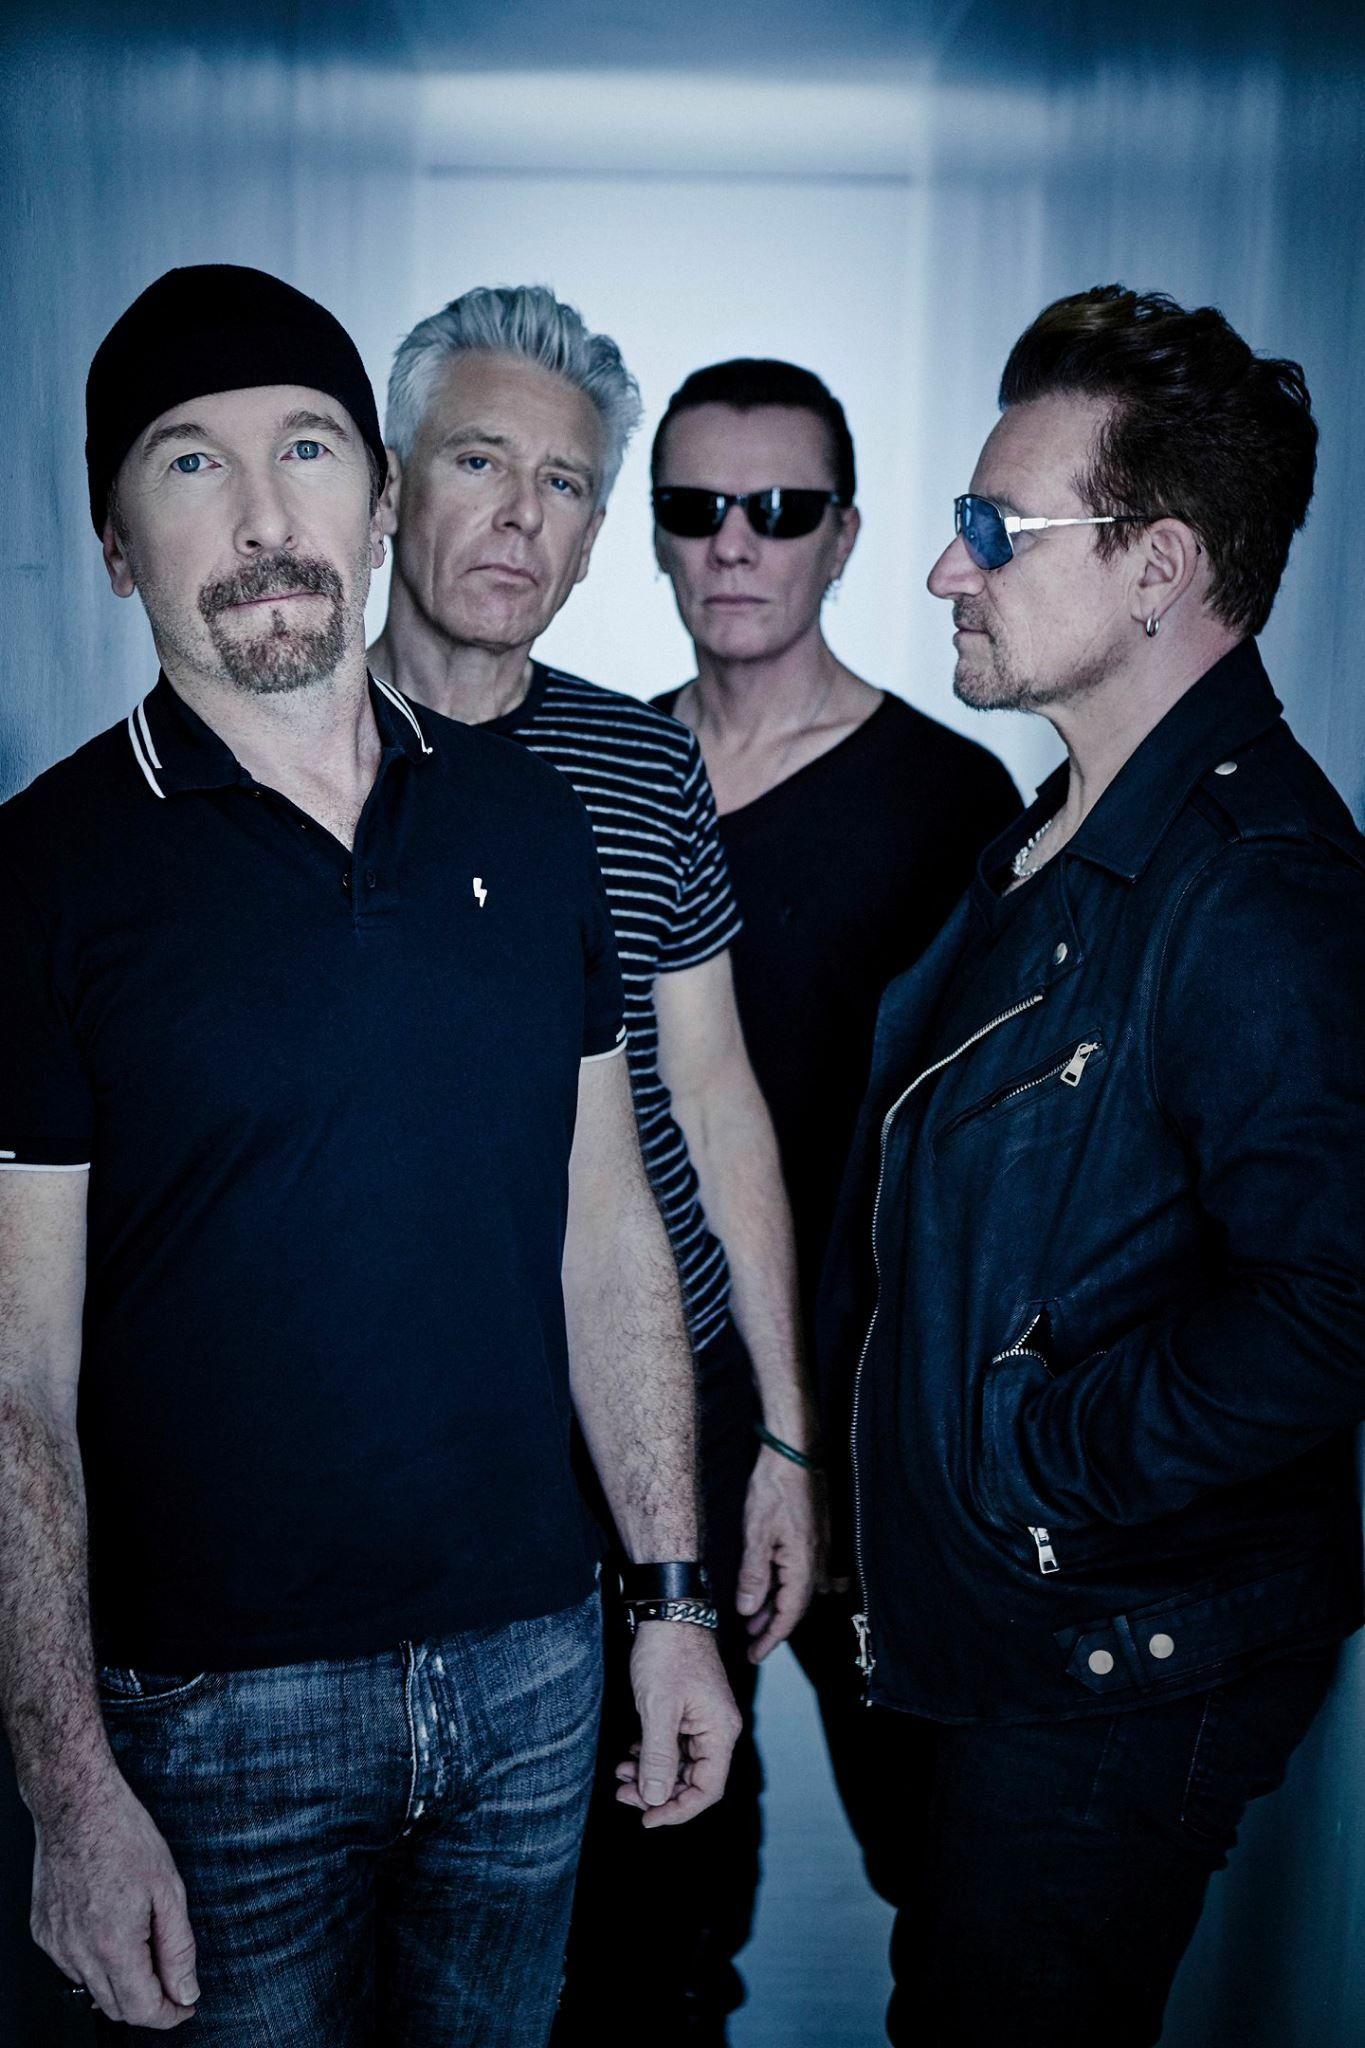 Pin by Karen Reuter on MUSIC to MY ears in 2019 | U2 songs